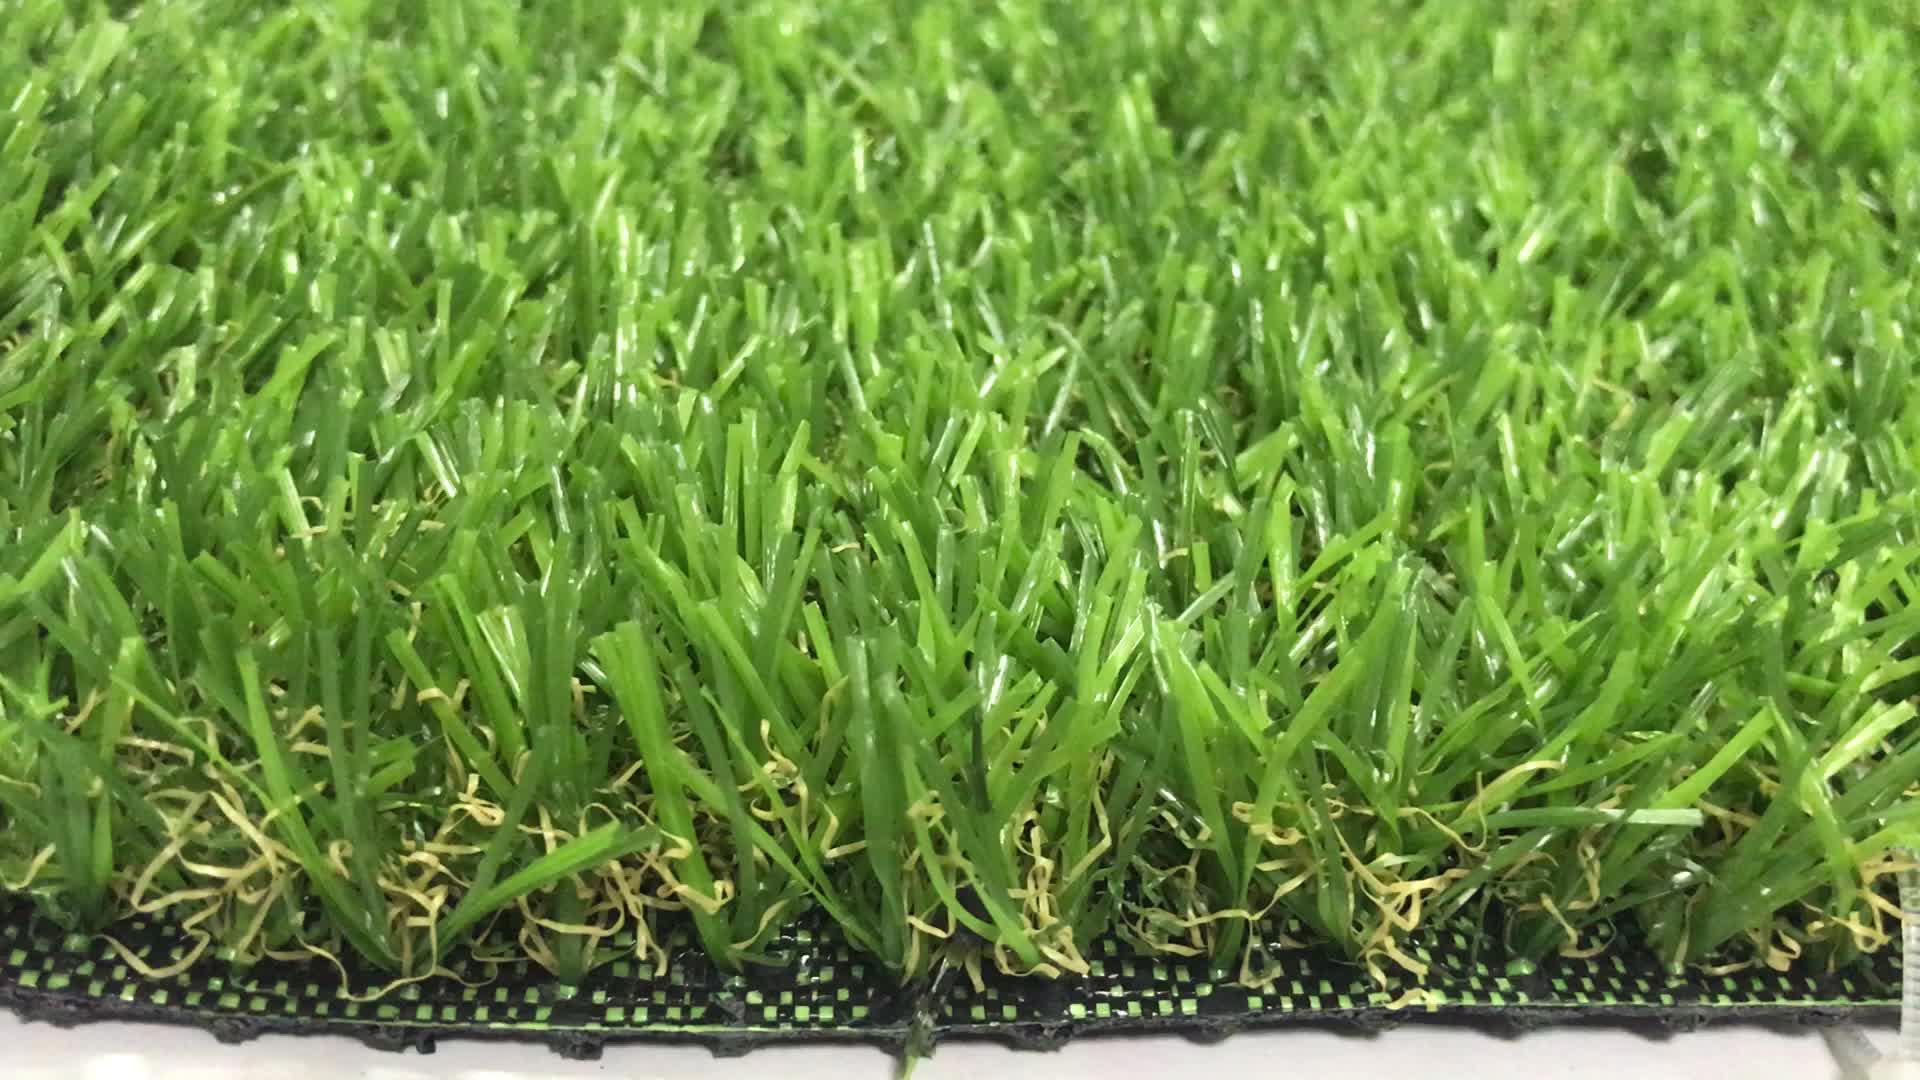 LW06 רך C צורת דשא 35mm חיצוני דשא מלאכותי שטיח עבור גן משחקים